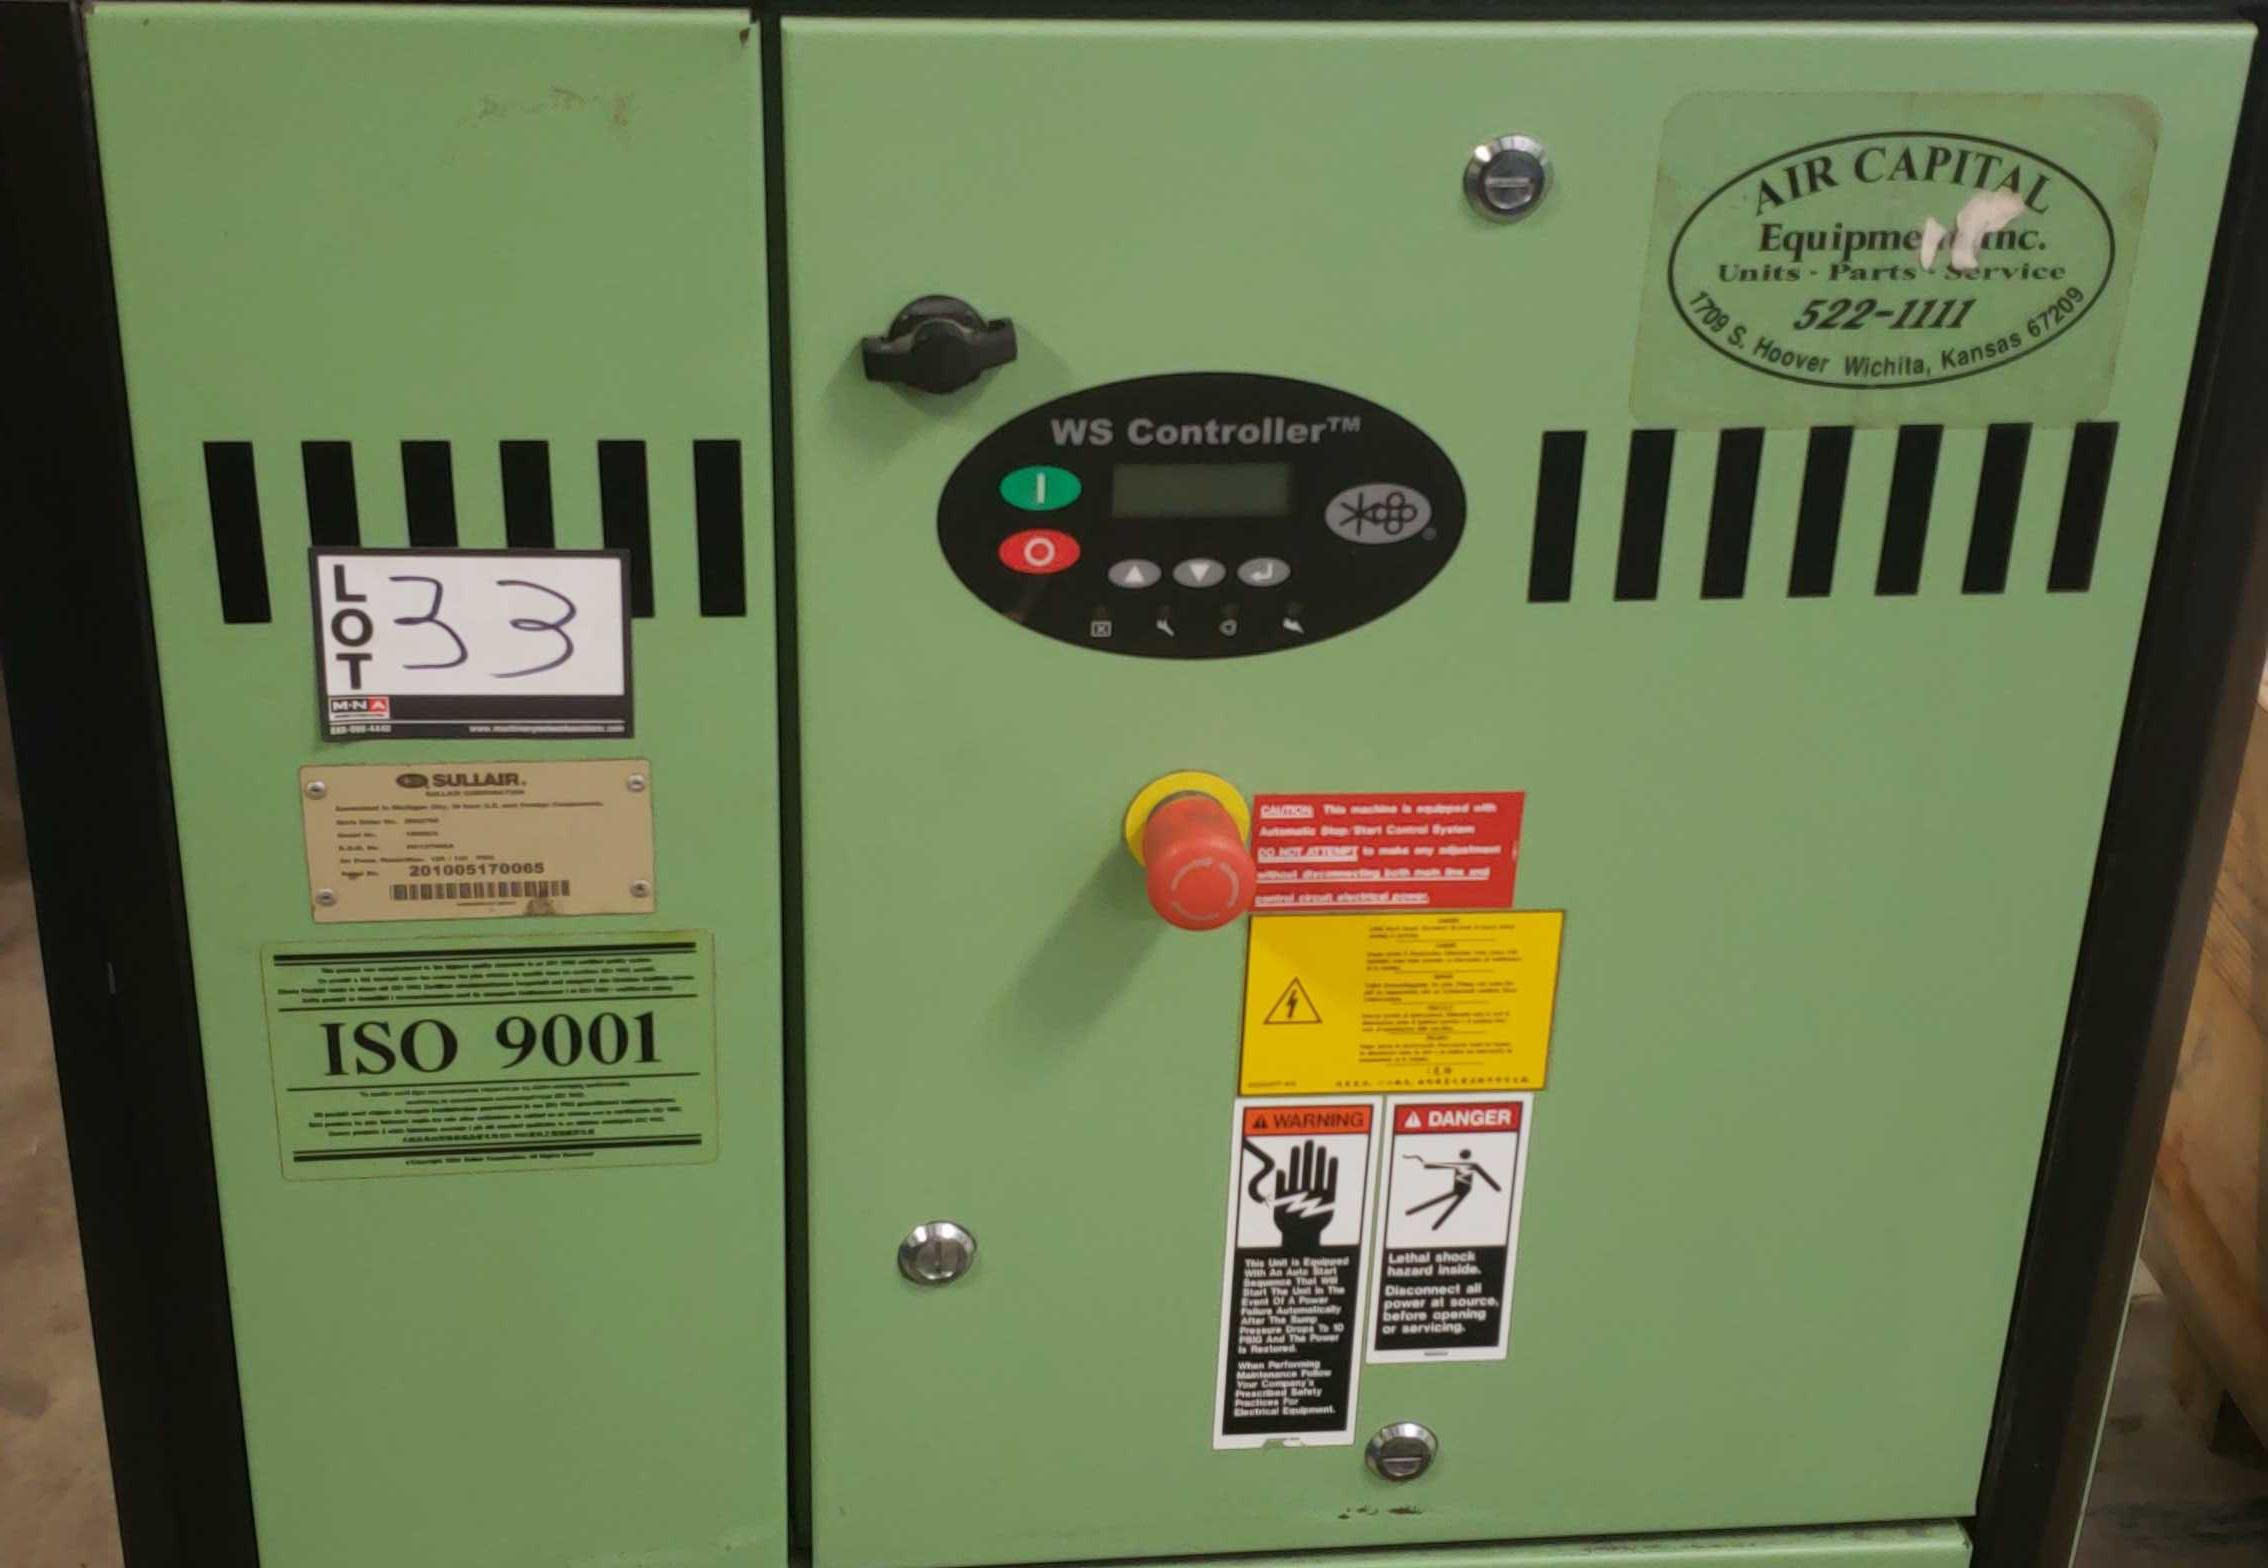 Lot 33 - Sullair 1800e model 1809E1A 25HP Air Compressor 201005170065